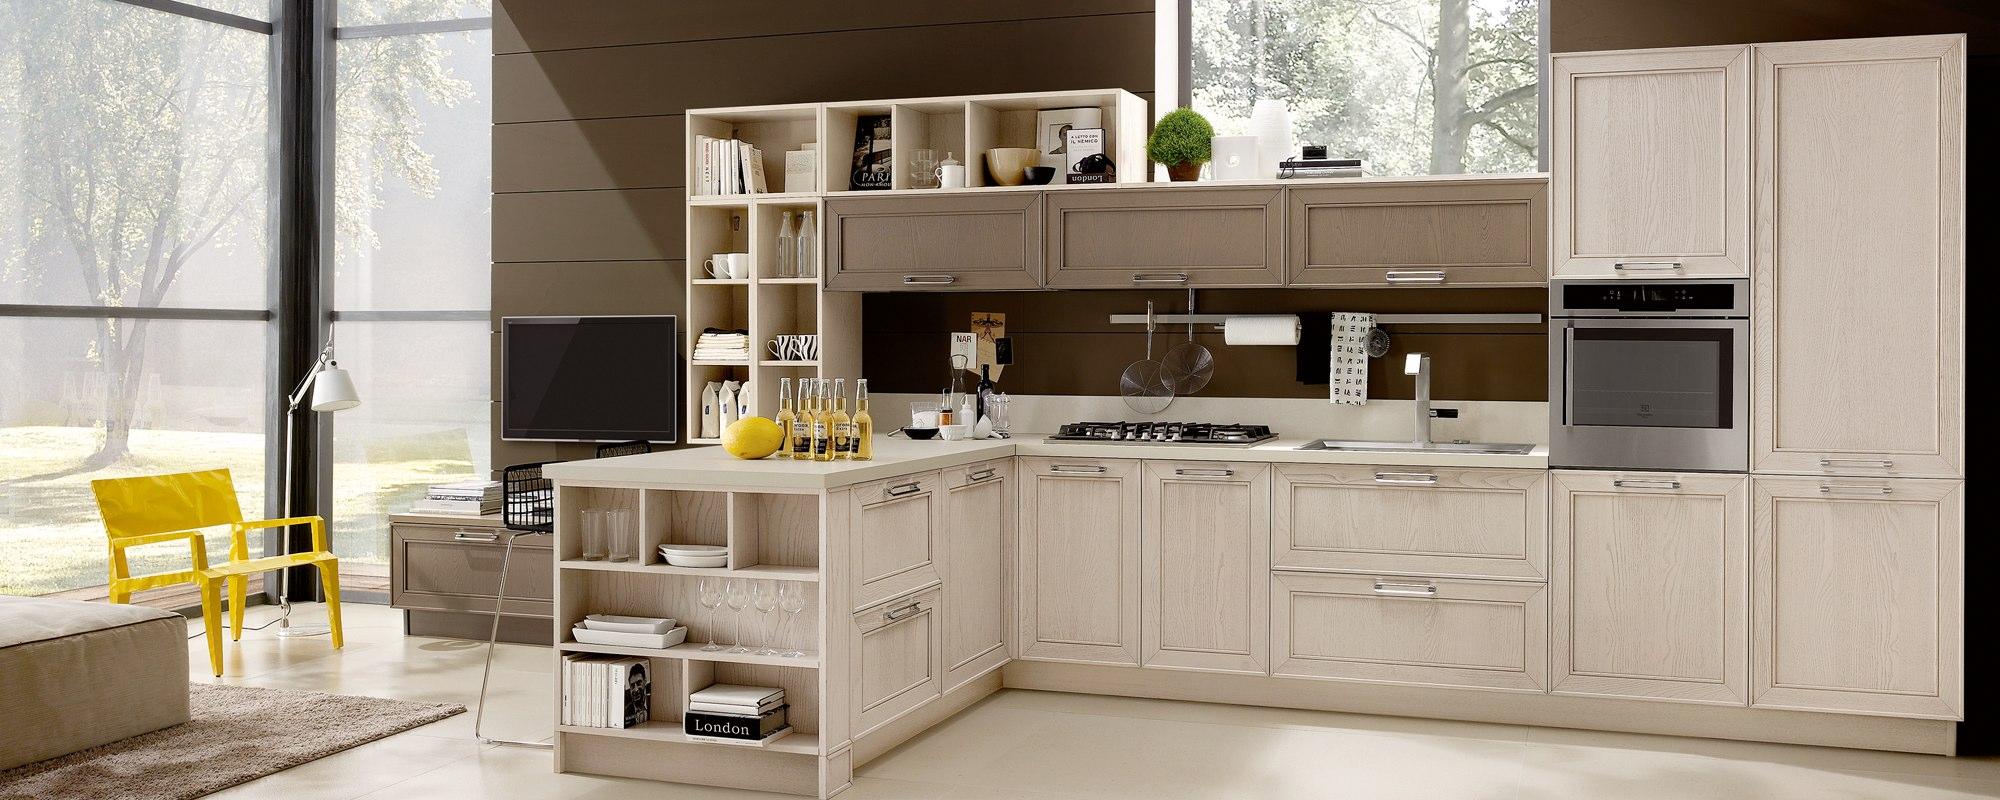 Stosa maxim mobili gala - Catalogo stosa cucine ...